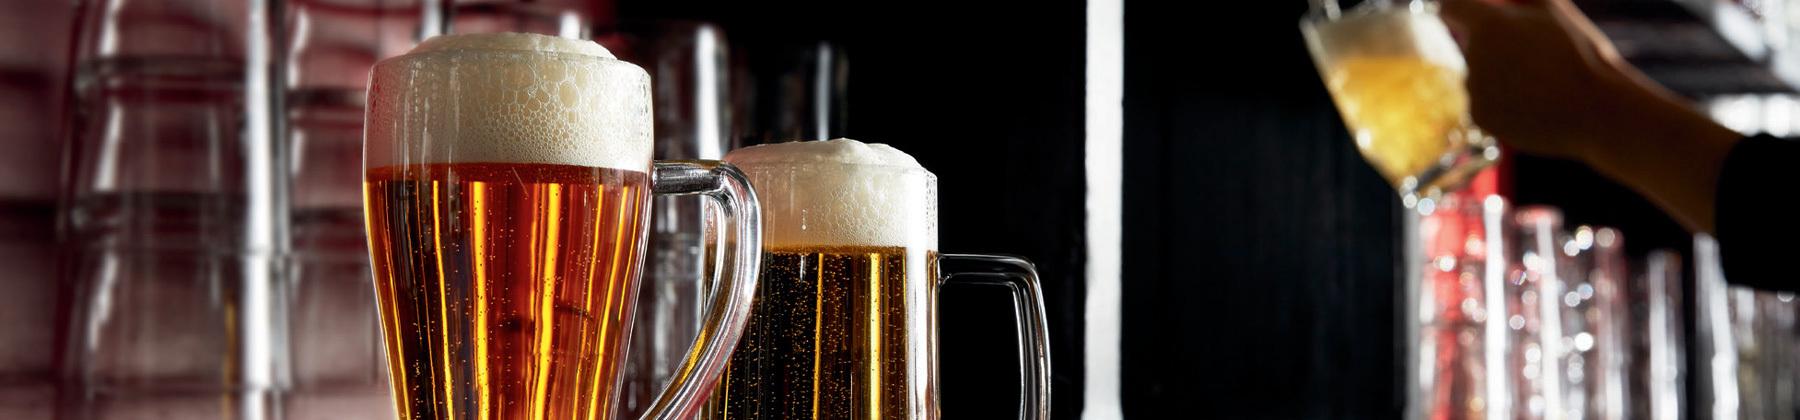 Photo of beer pilsner glasses.